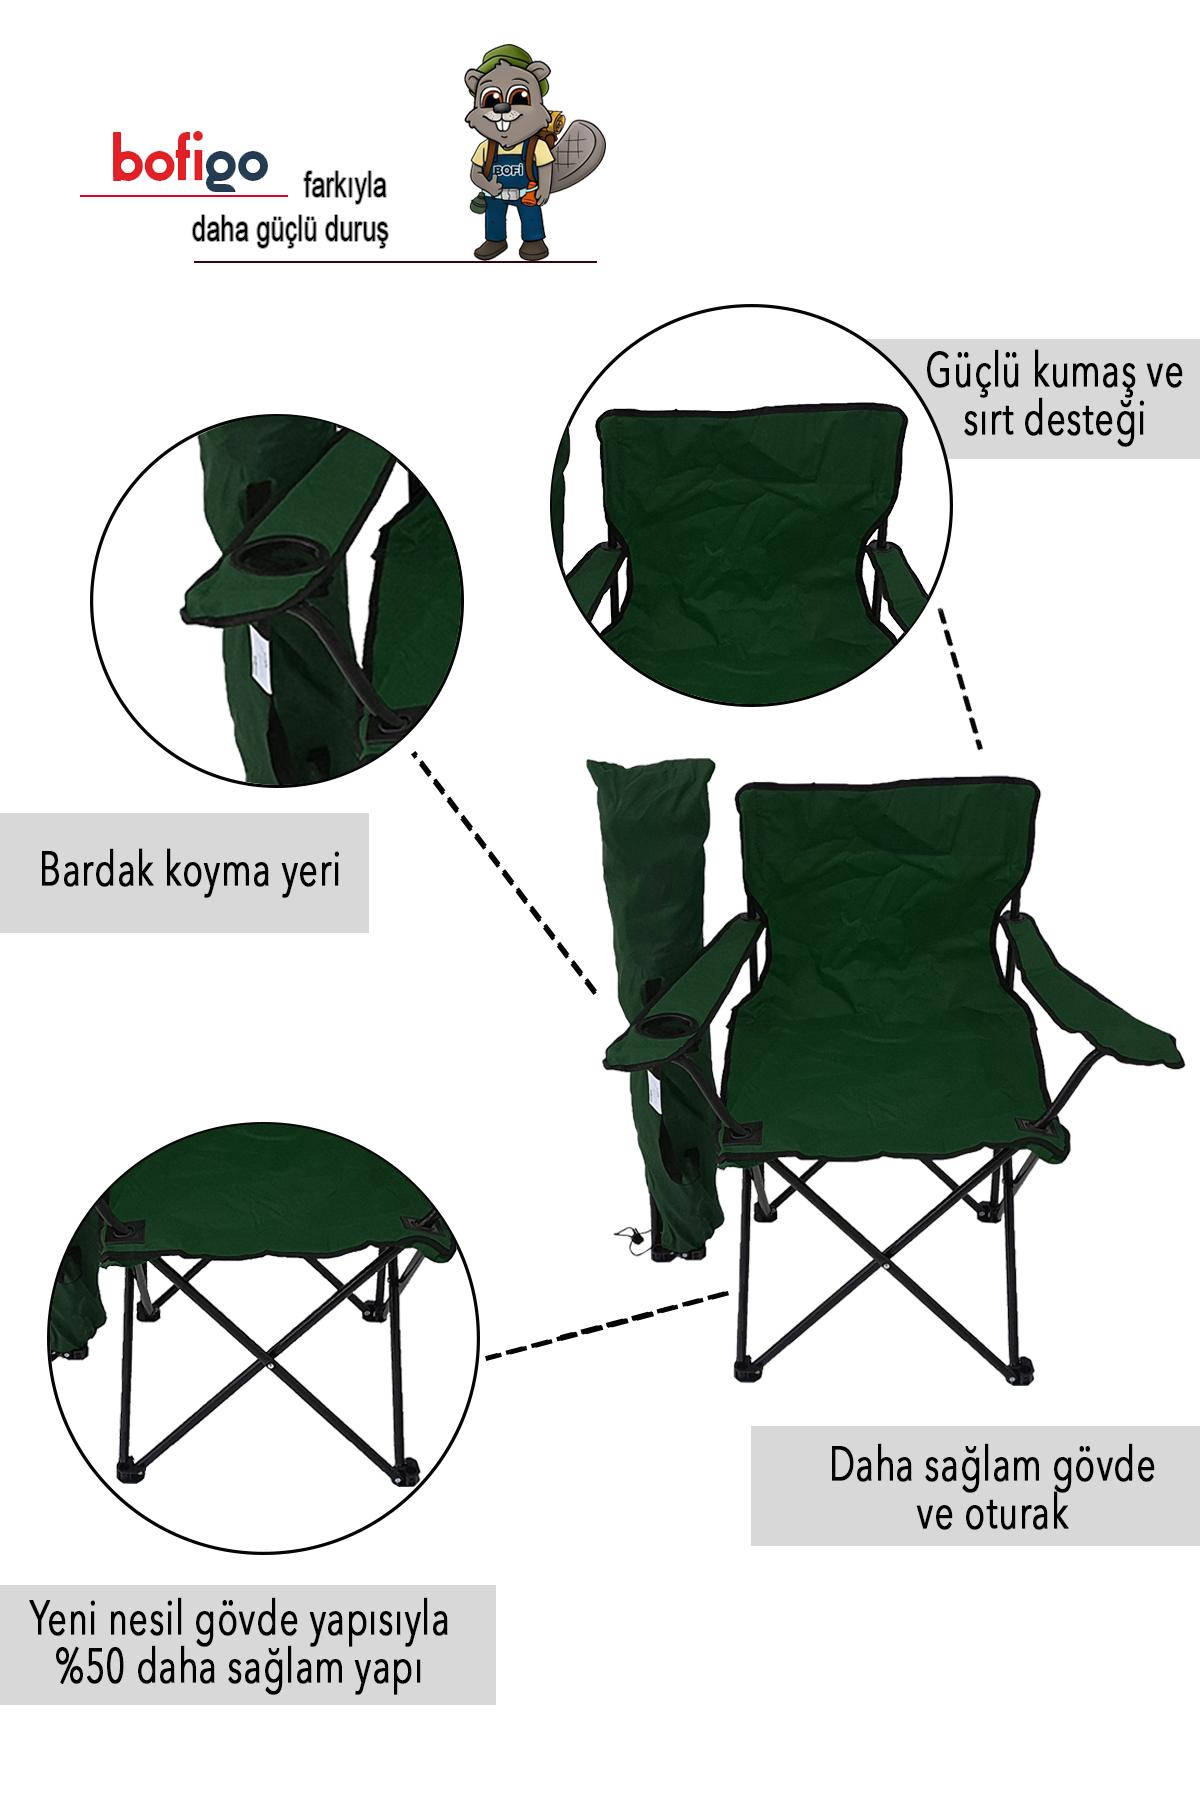 Bofigo 4-Seat Camping Chair Picnic Chair Folding Chair Camping Chair with Carrying Bag Green